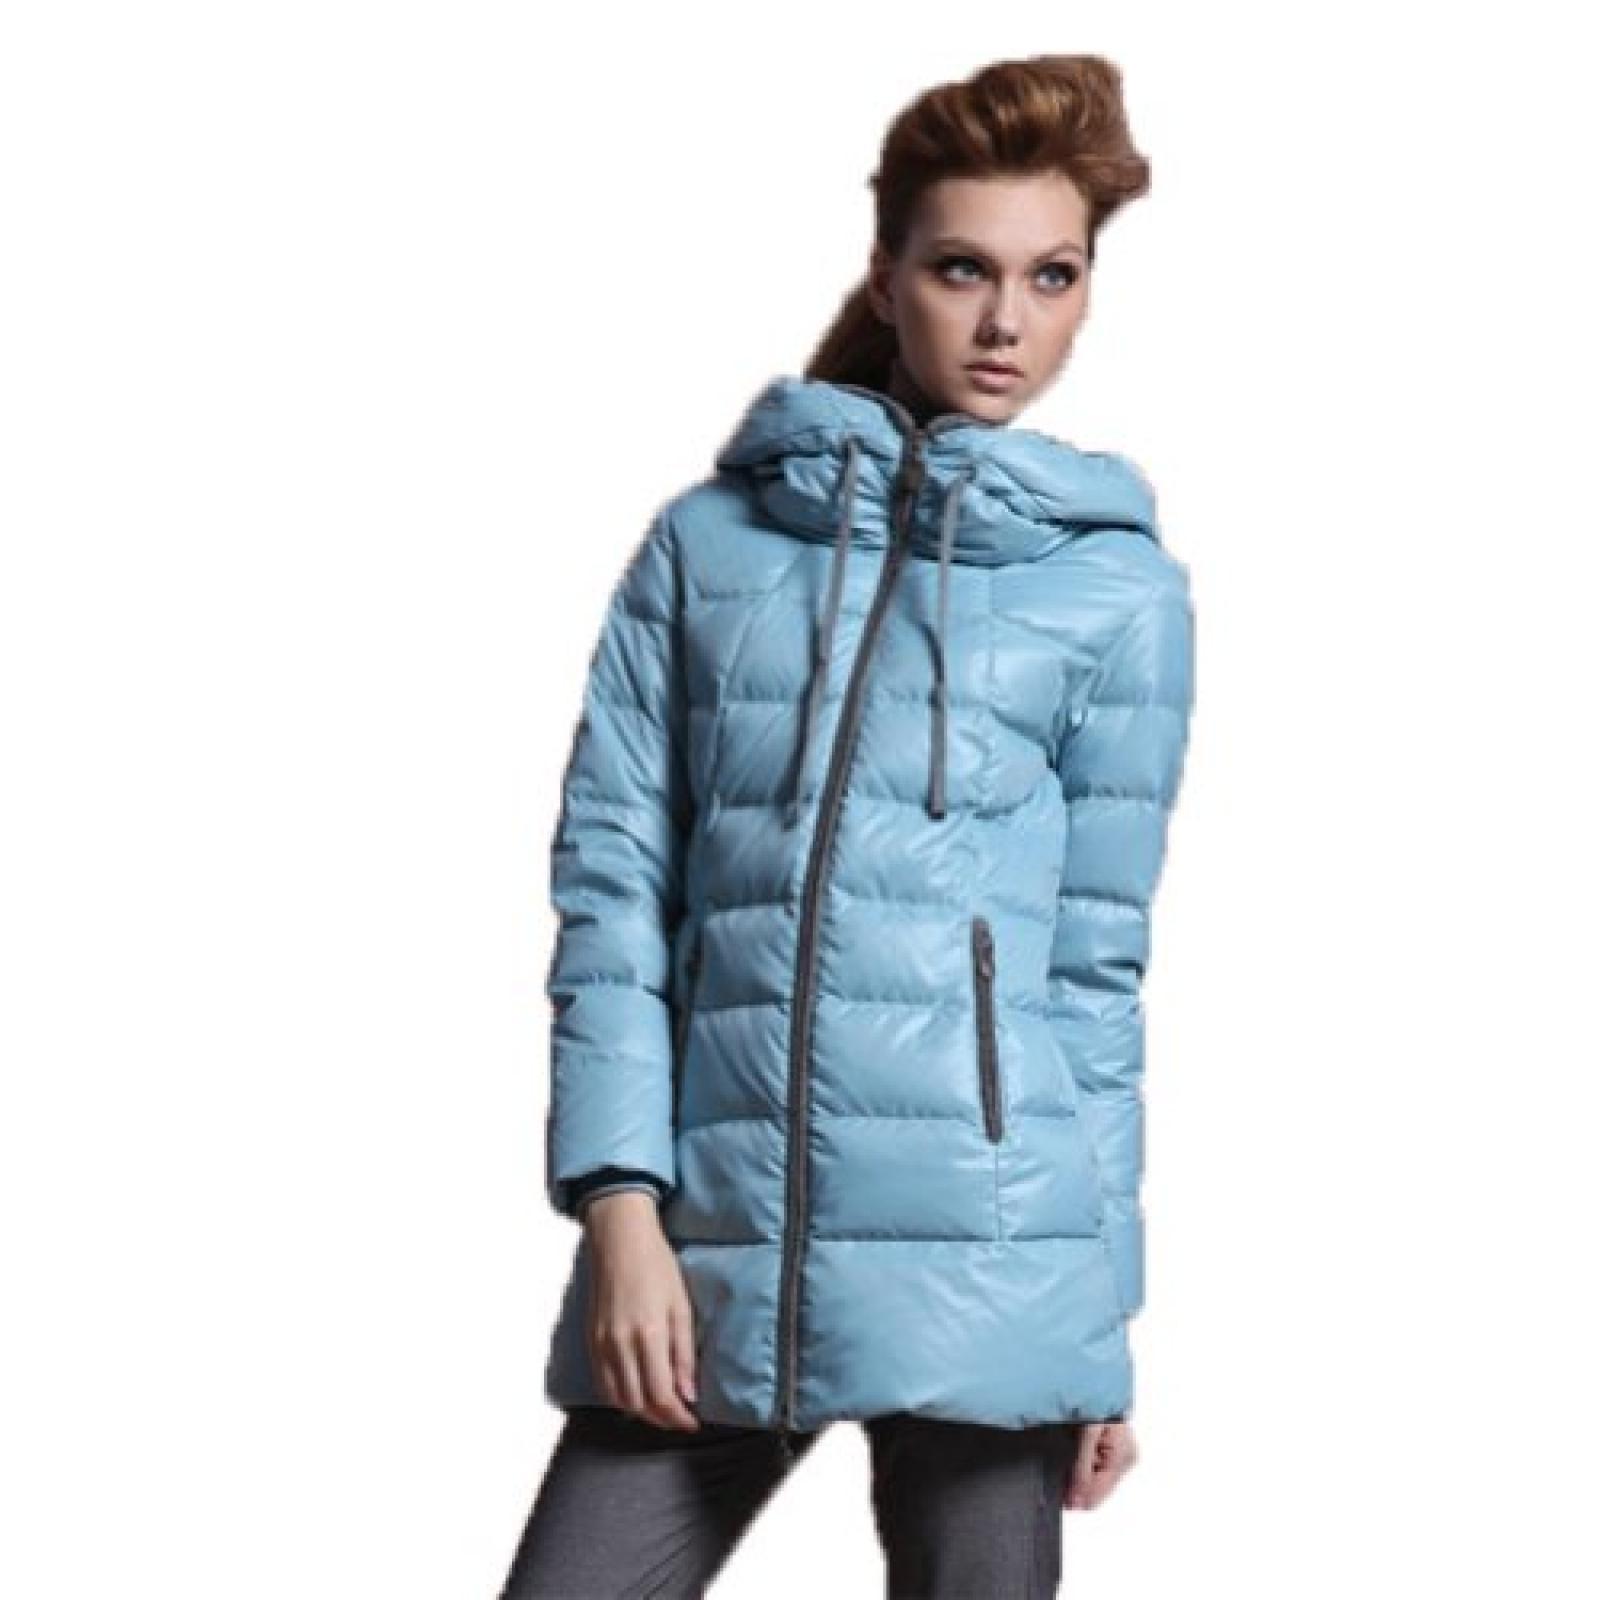 EWEMALLJA Damen Daunenjacke Langmantel mit Kapuze Winter warm in verschiedenen Farben